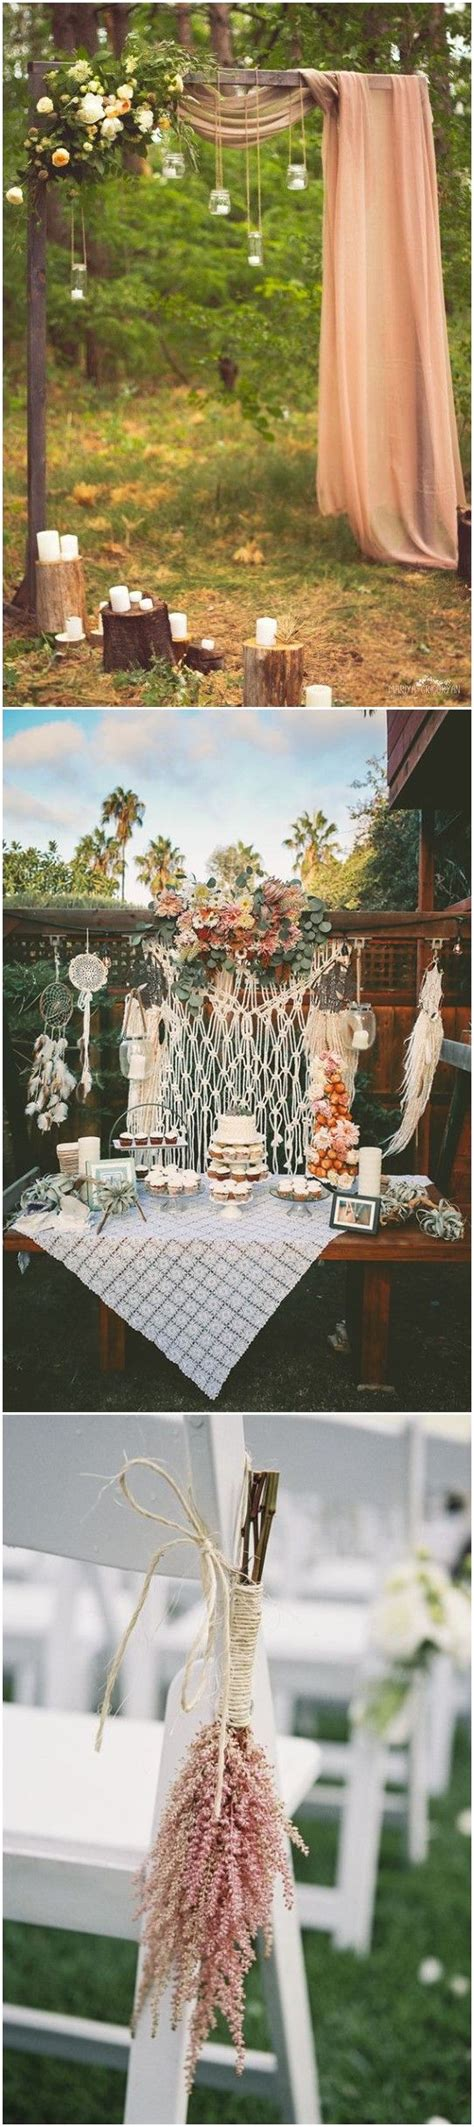 25 best ideas about wedding decorations on pinterest